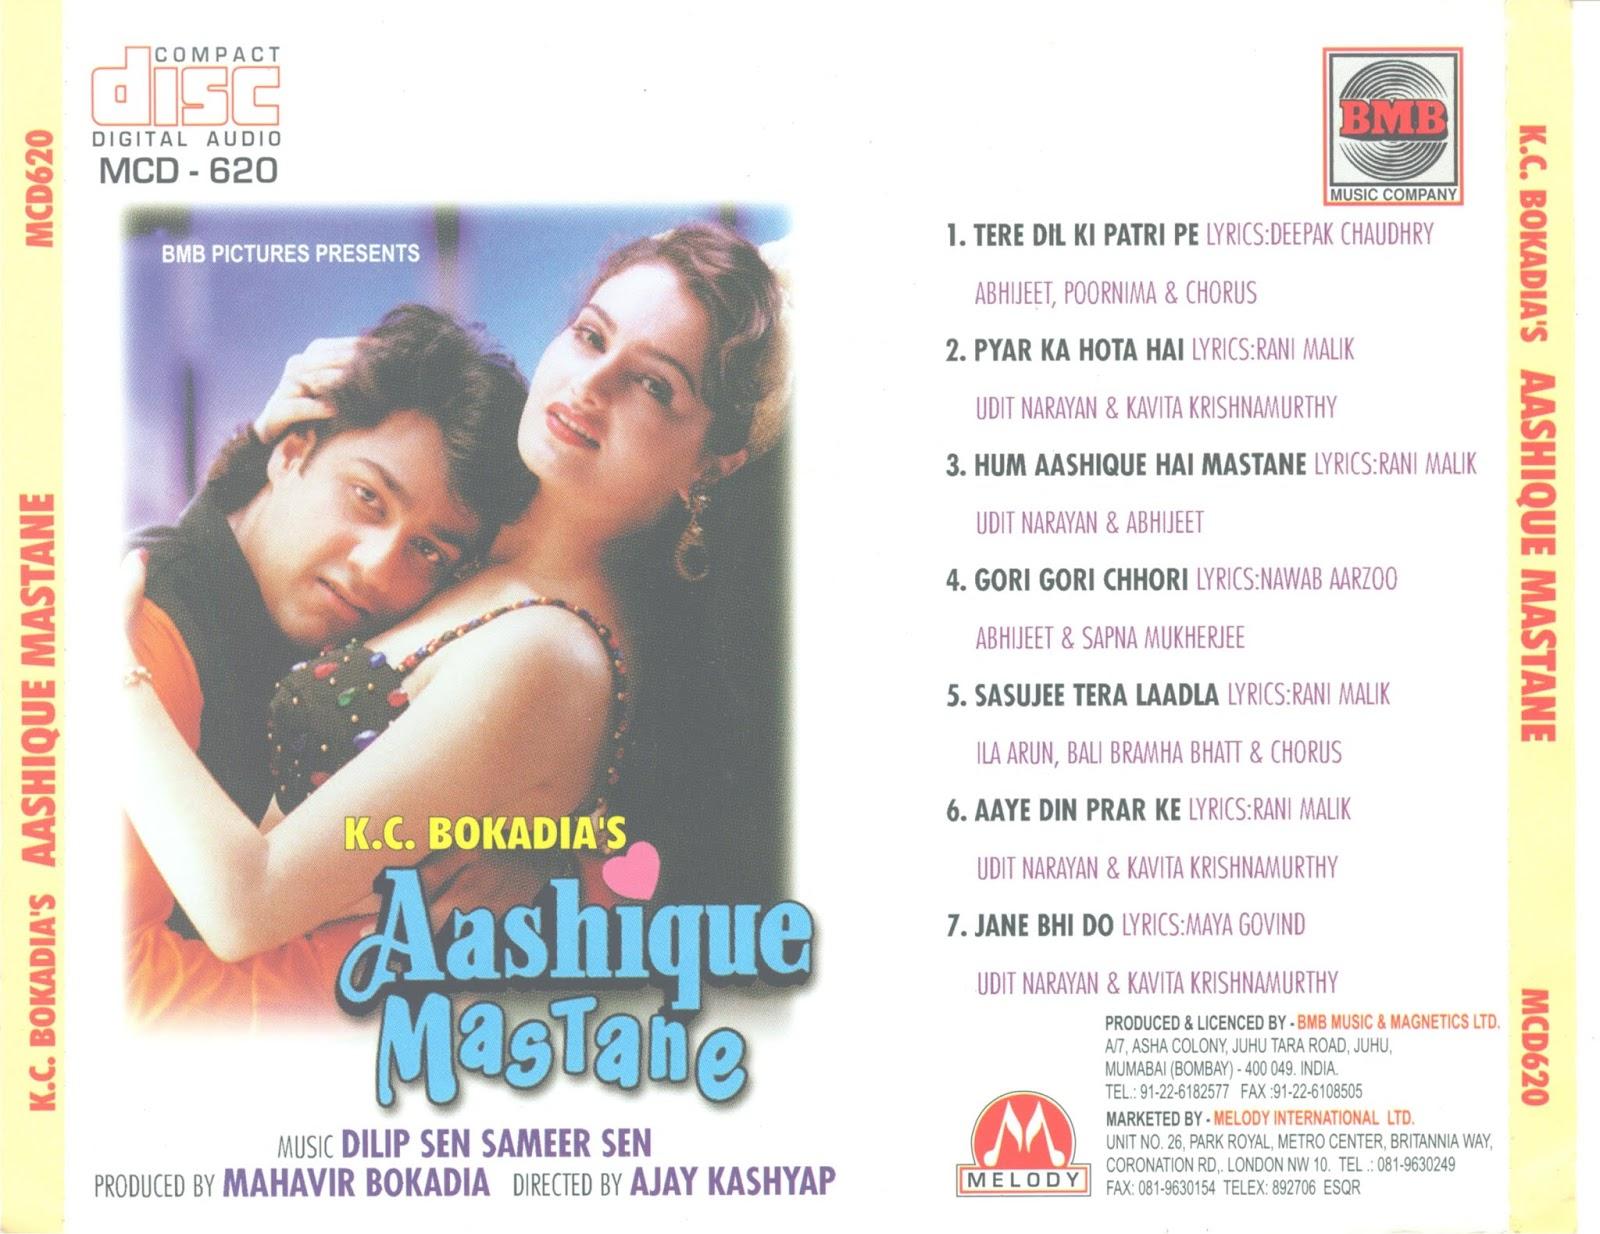 aashiq mastane mp3 song